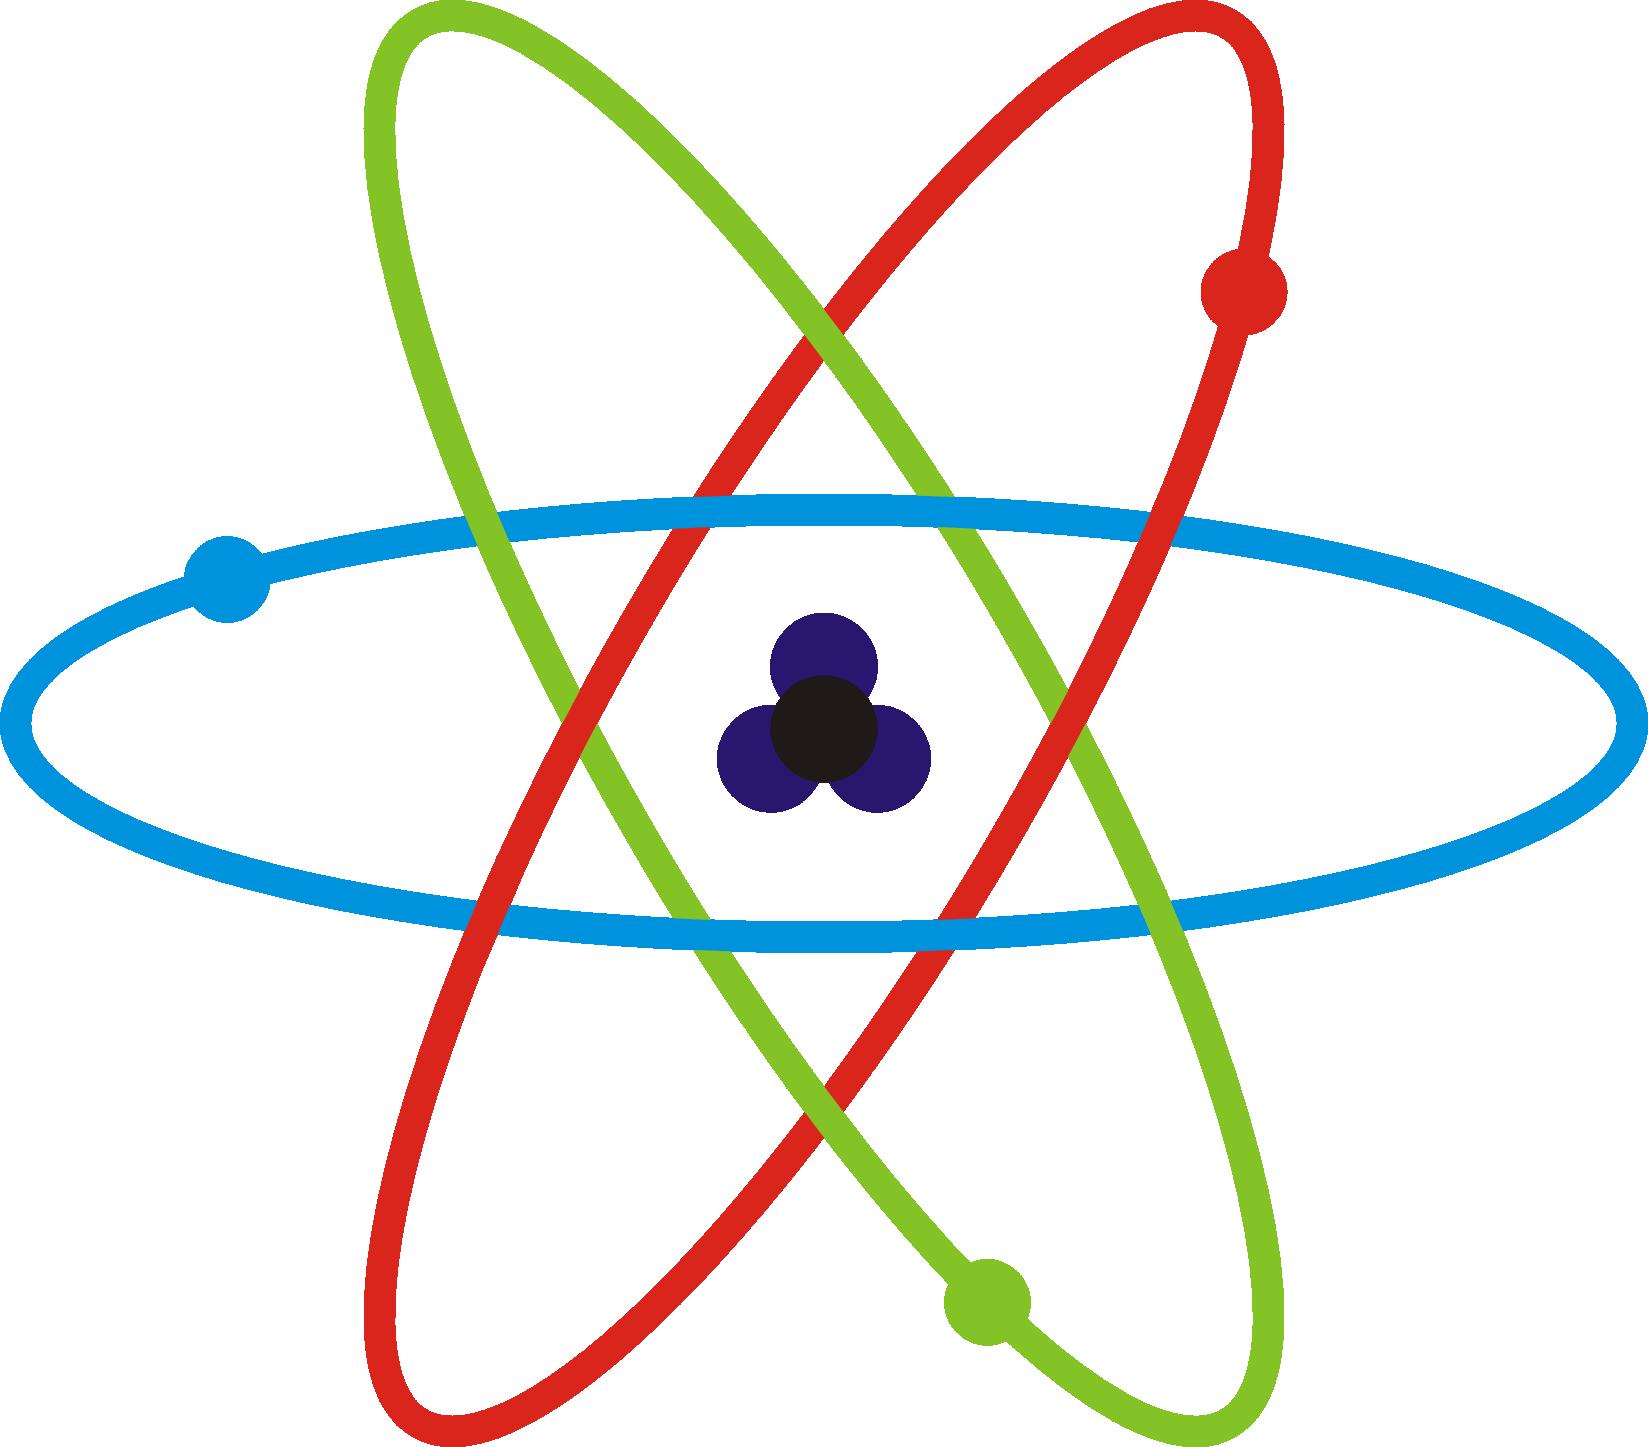 Proton clipart graphic freeuse library Neutron Clipart - Clip Art Library graphic freeuse library